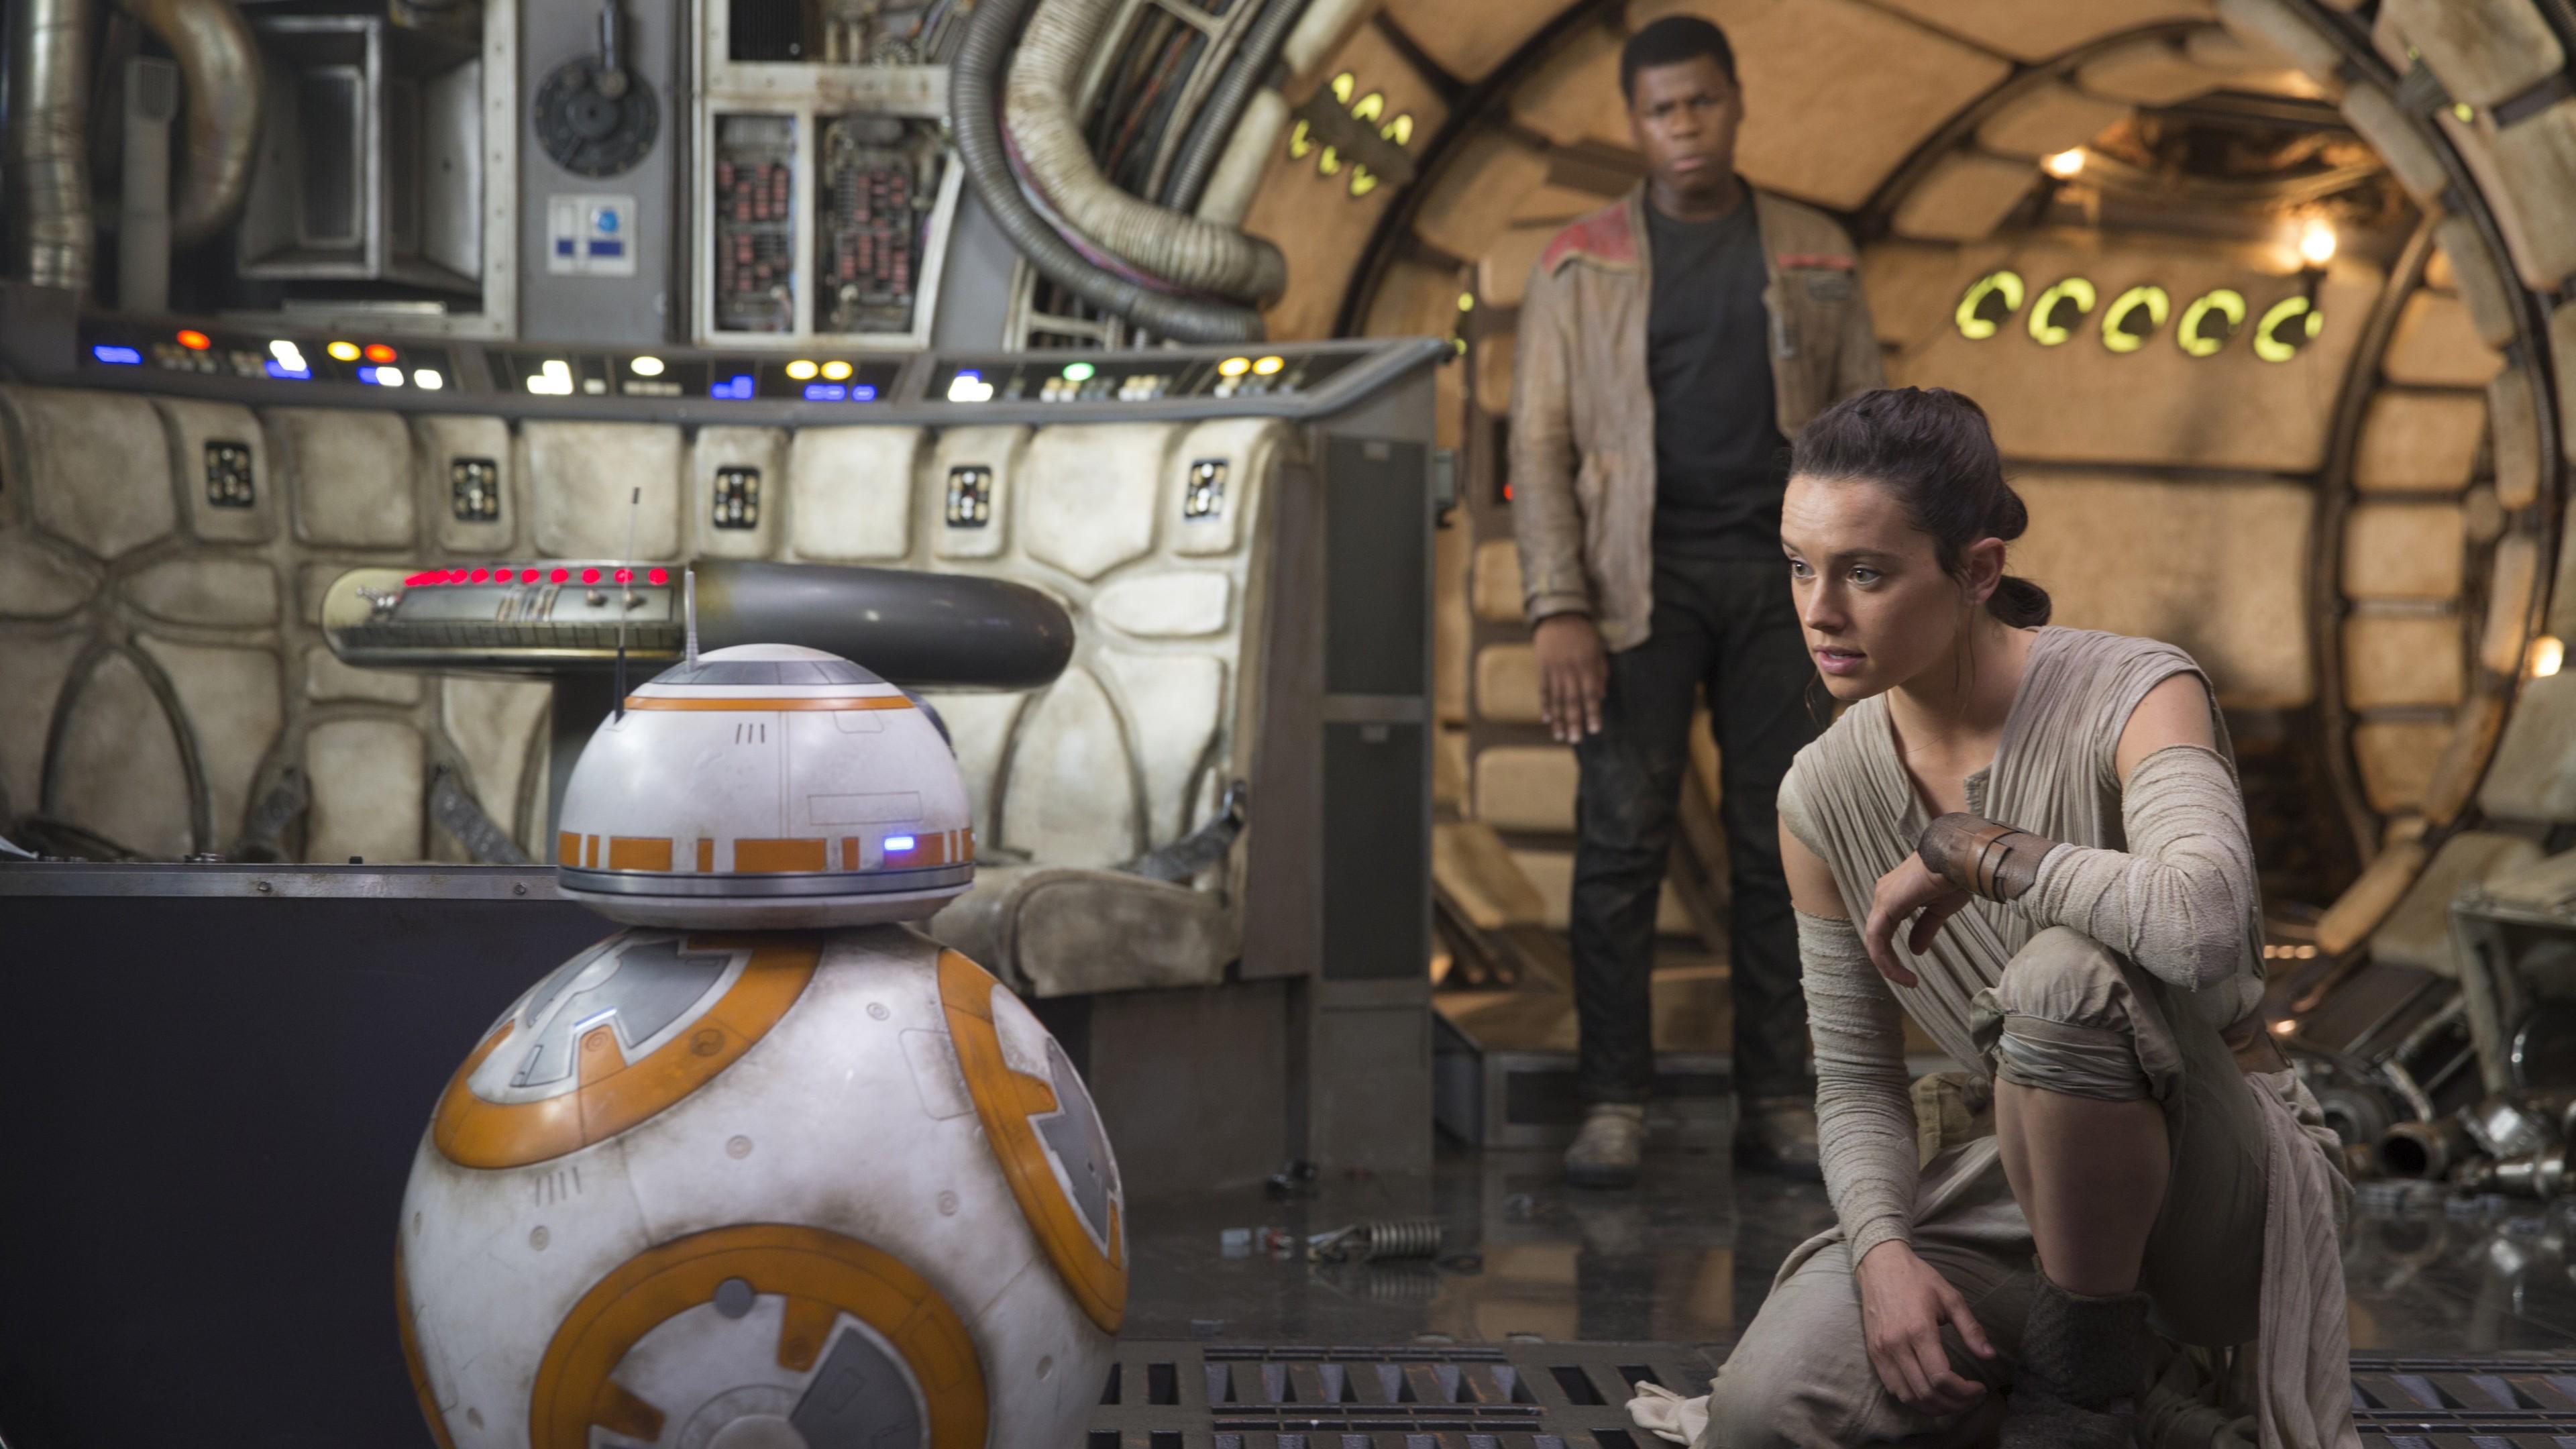 Wallpaper 4k Star Wars Episode Vii The Force Awakens Movie